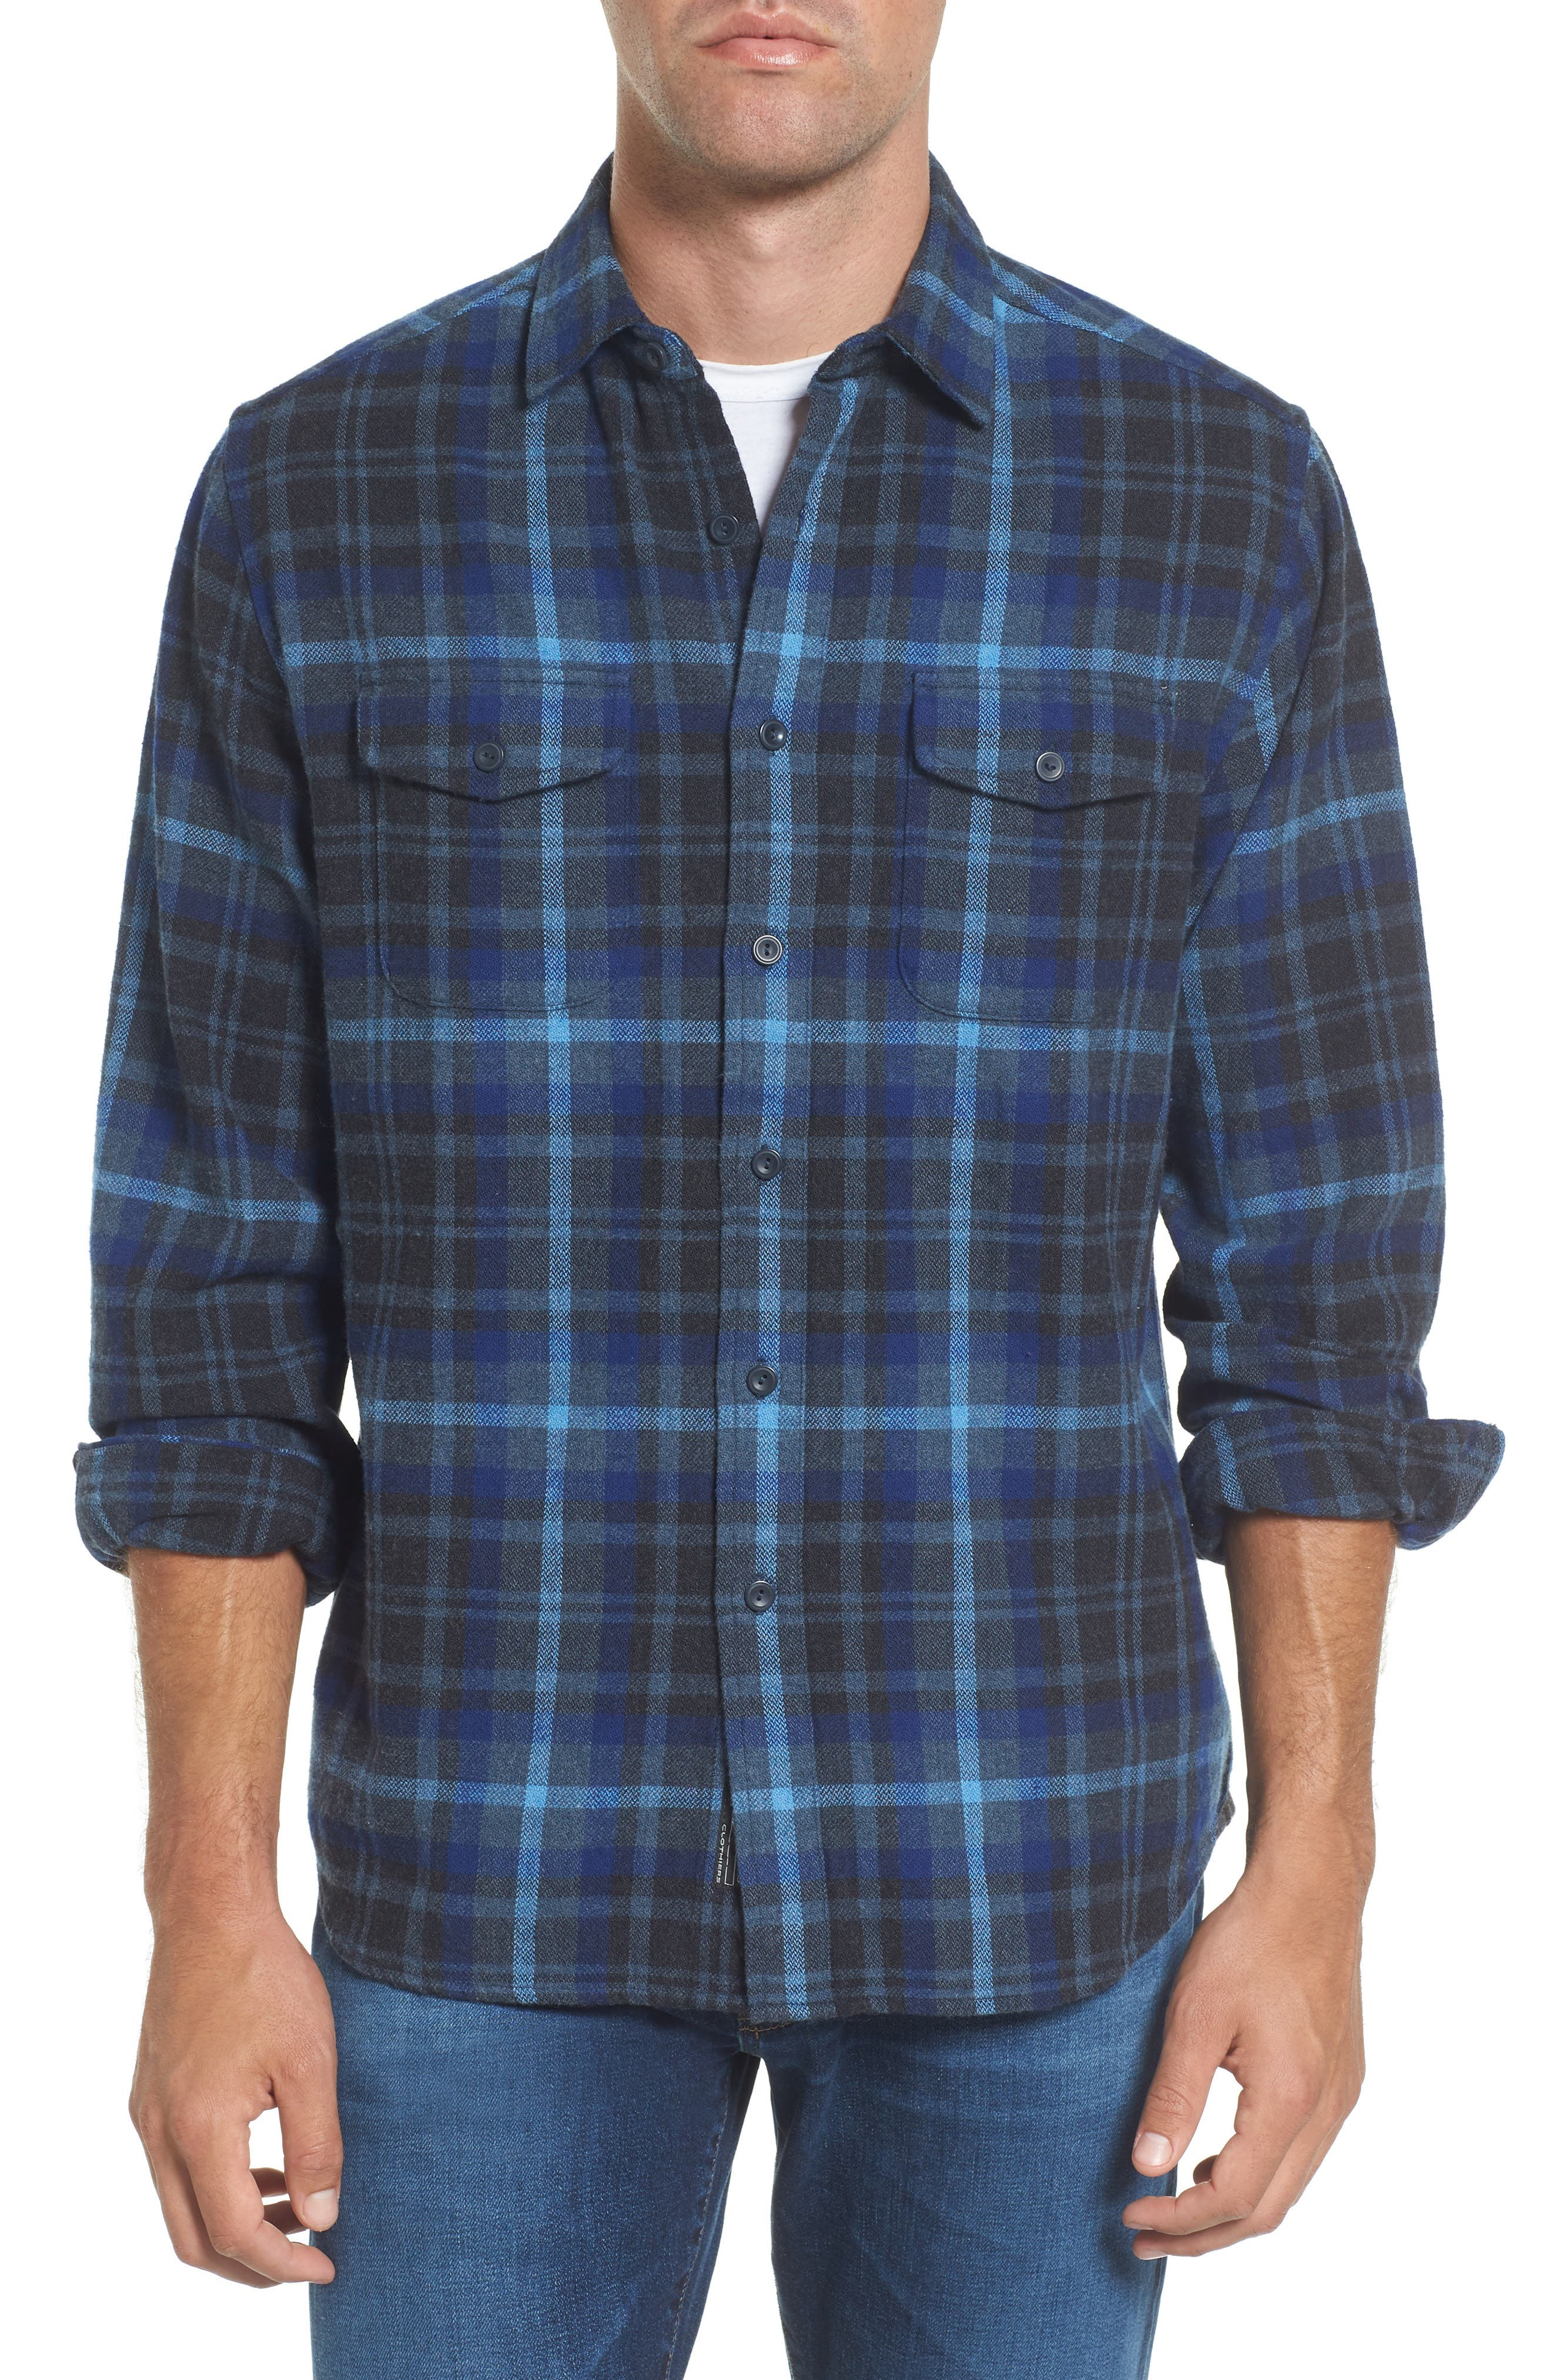 Barton Modern Fit Plaid Flannel Sport Shirt,                         Main,                         color, Charcoal Royal Gray